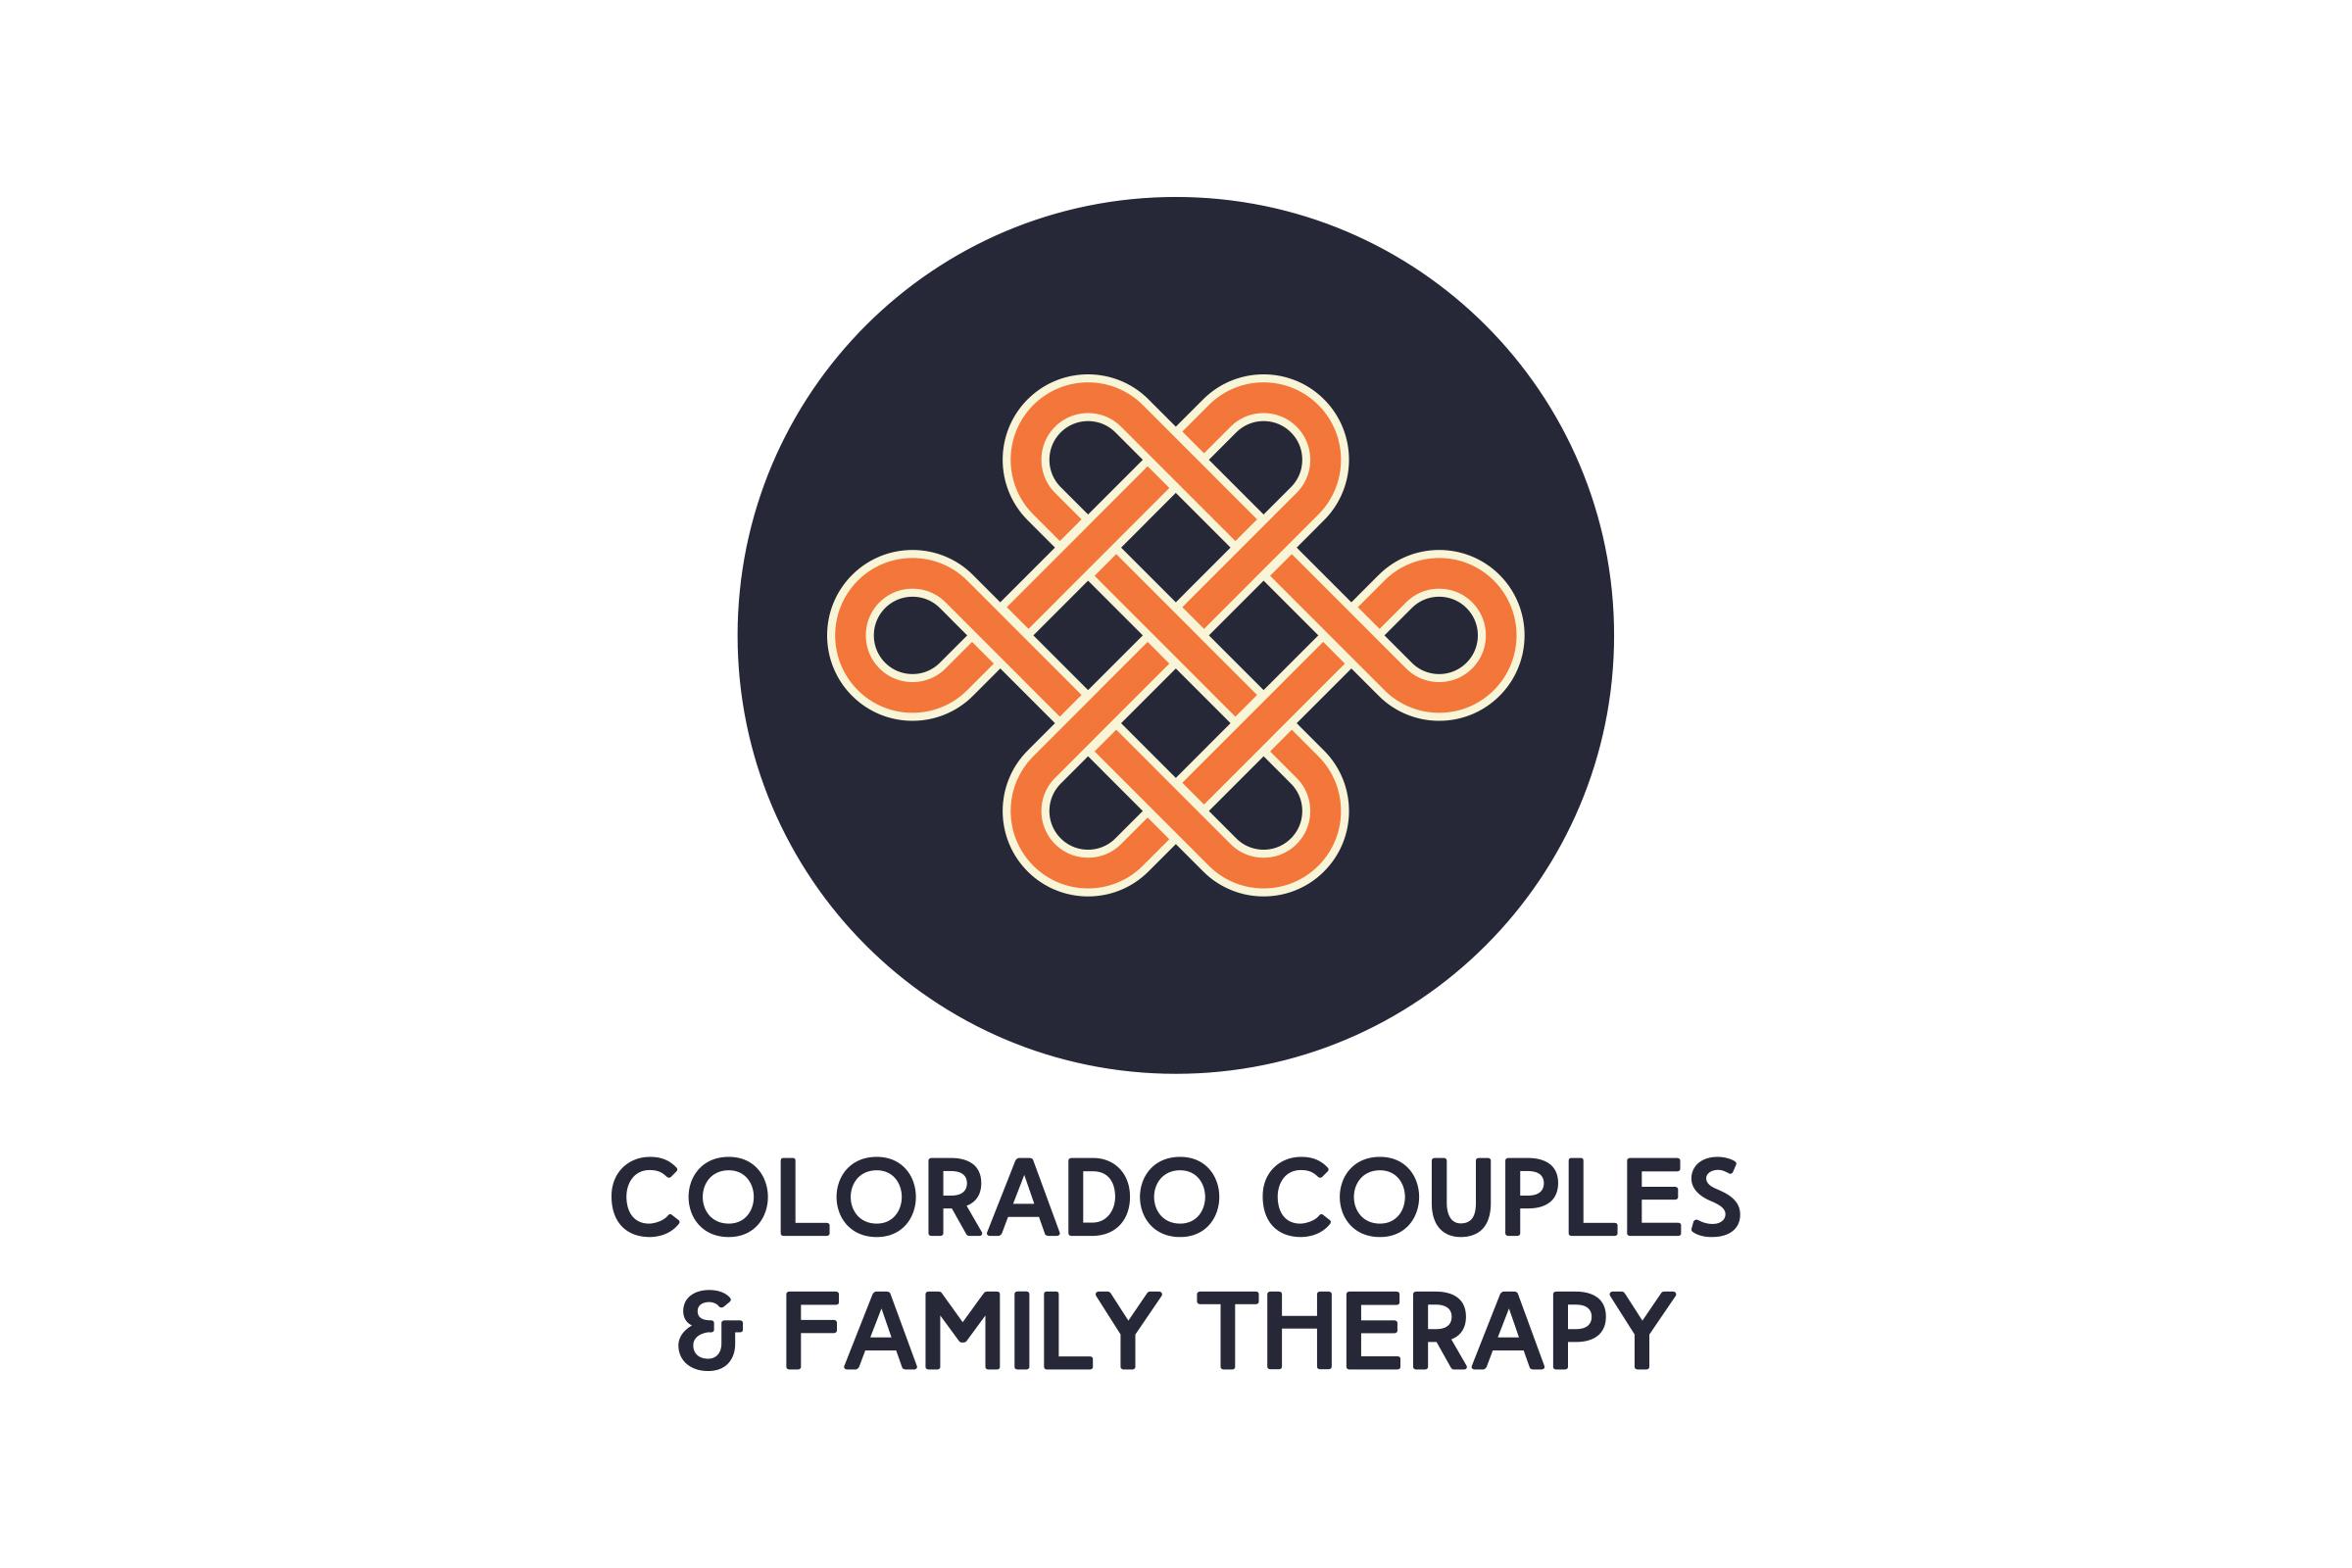 hearthfire-creative-logo-brand-identity-designer-denver-colorado-colorado-couples-family-therapy-1.jpg